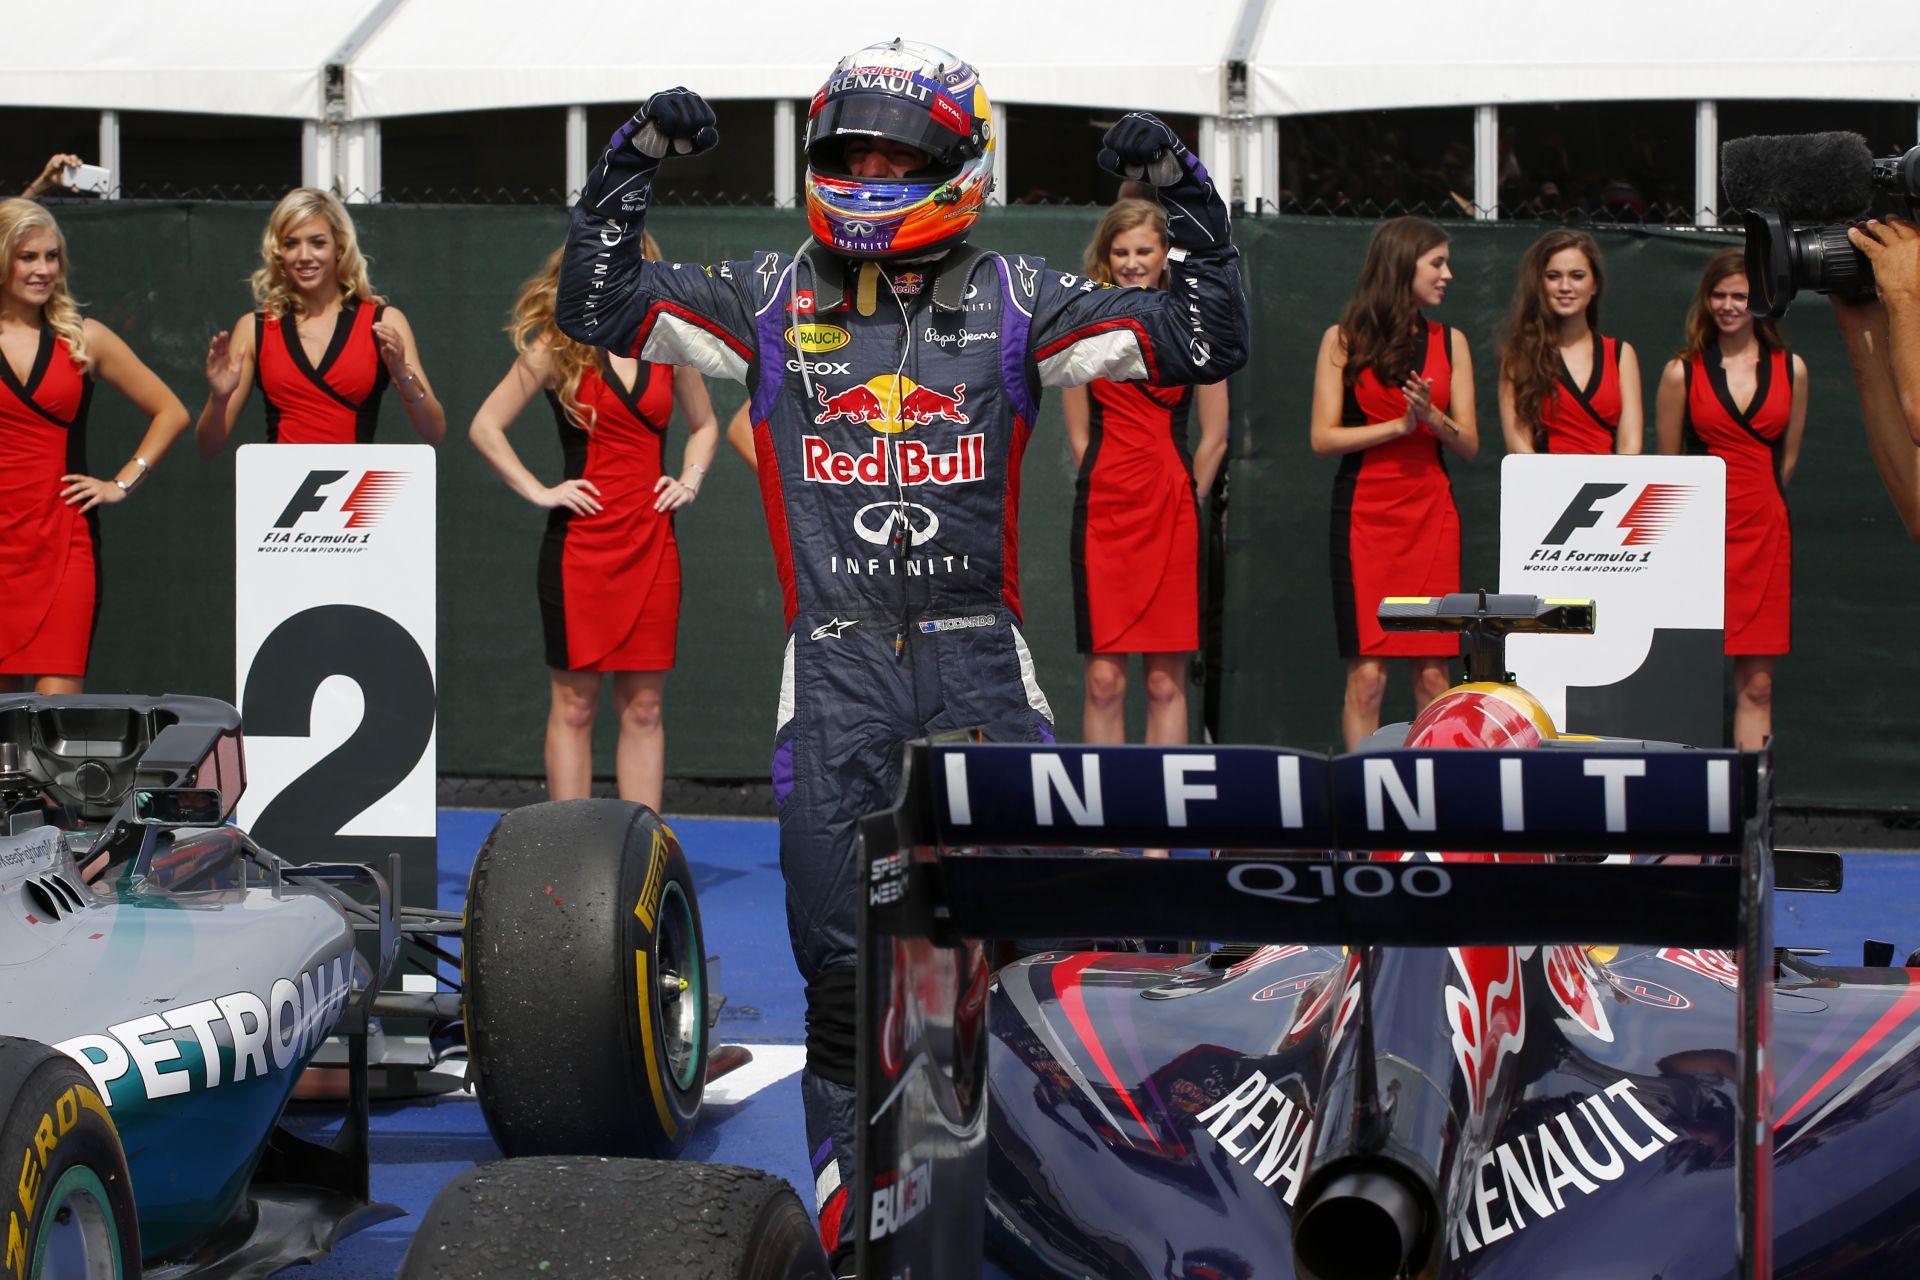 A Renault nagyon boldog Ricciardo kanadai győzelme miatt